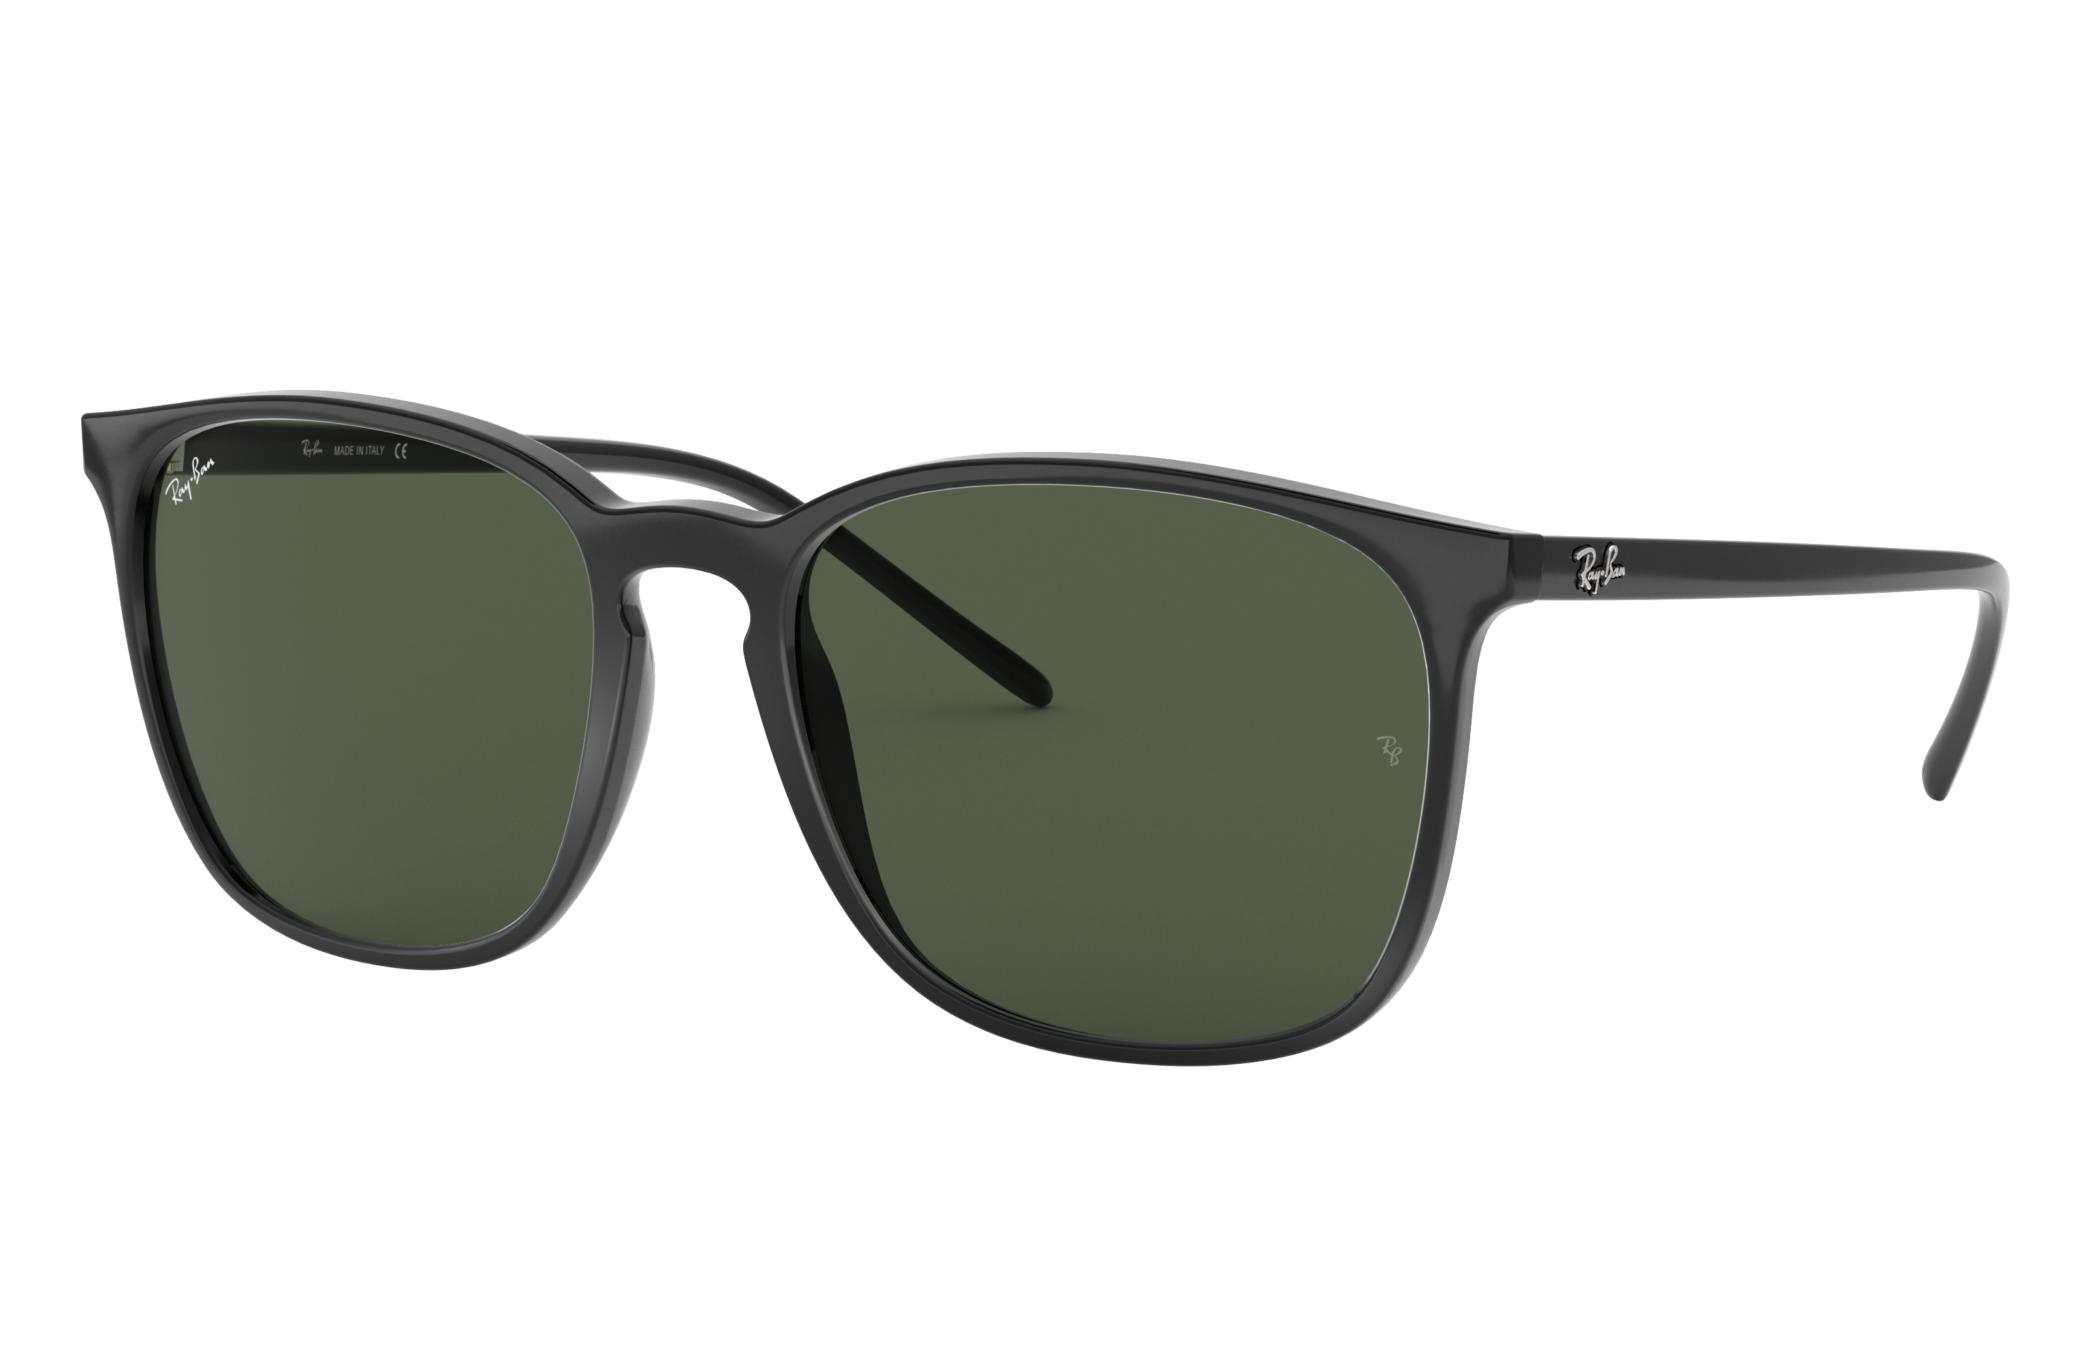 Ray-Ban Rb4387 Black, Green Lenses - RB4387